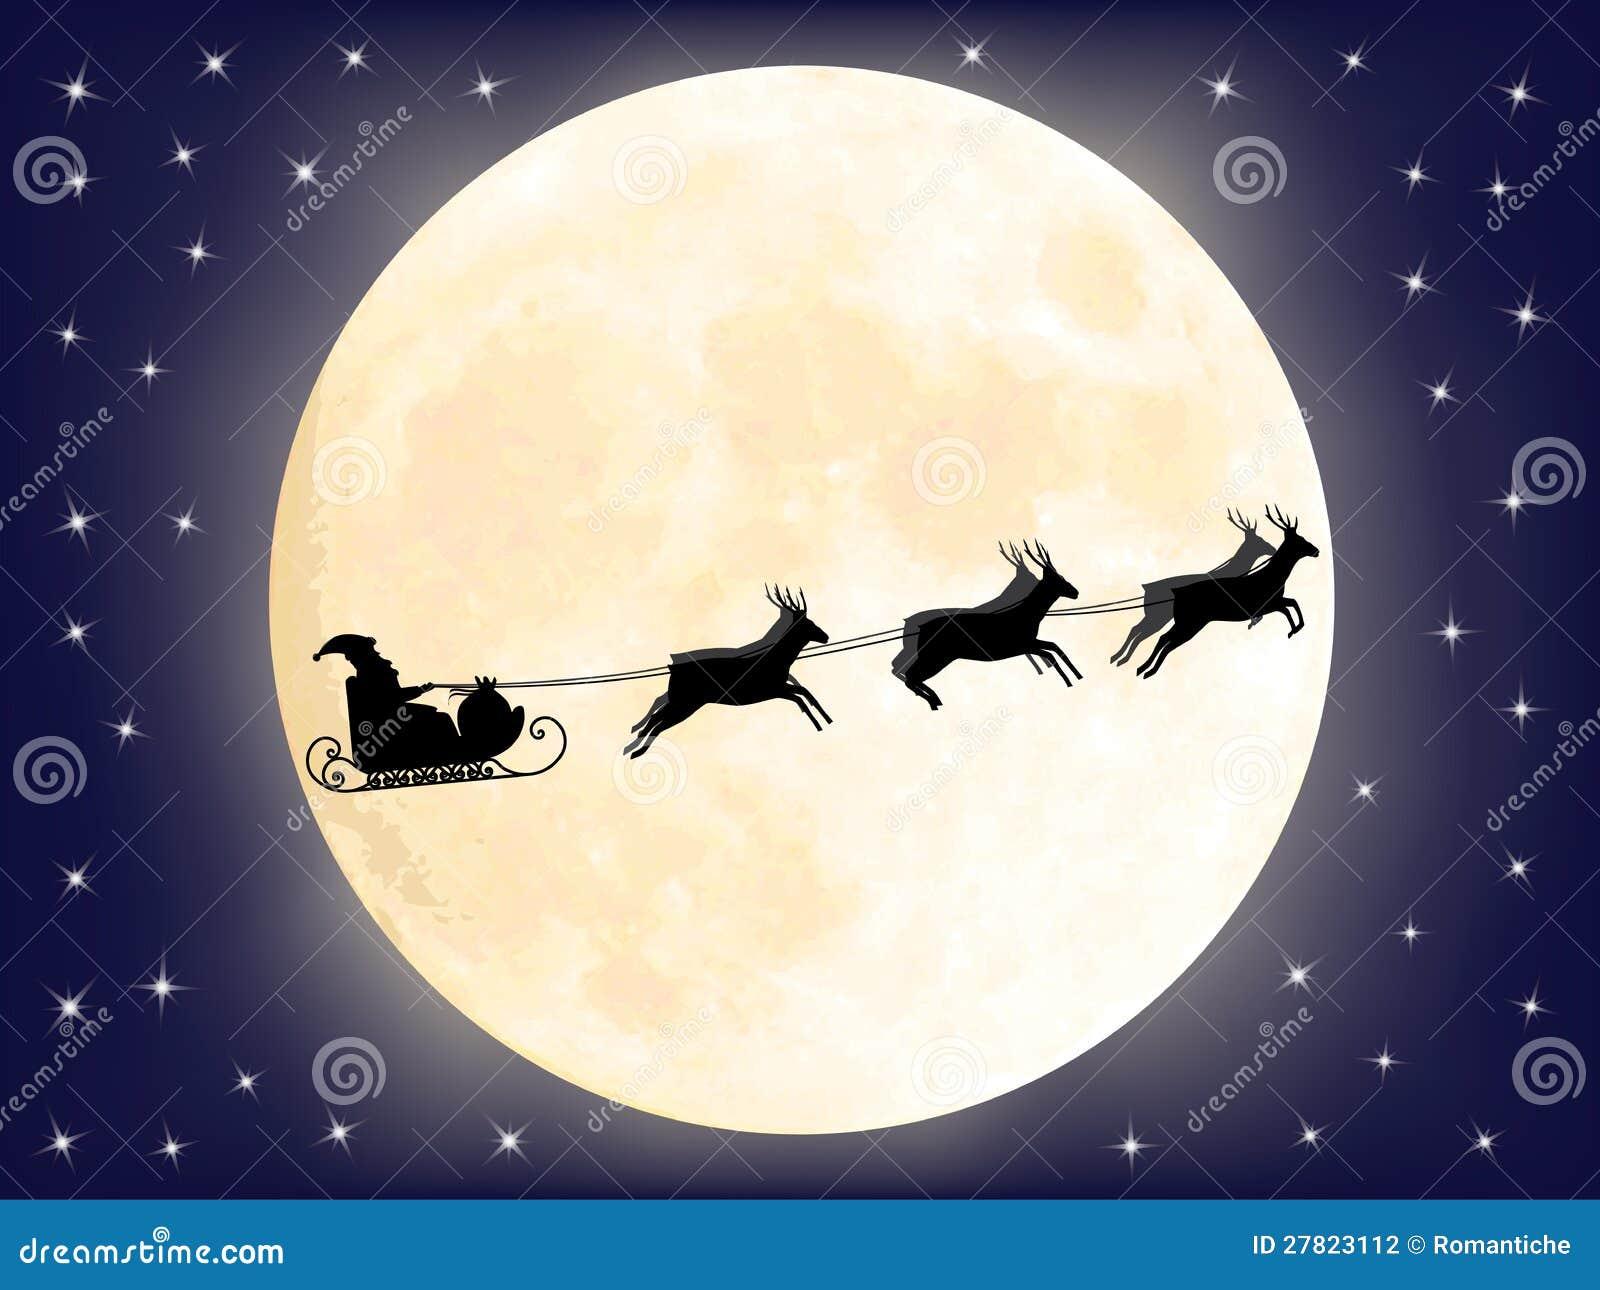 Santa sleigh silhouette moon santa claus sledge over moon stock